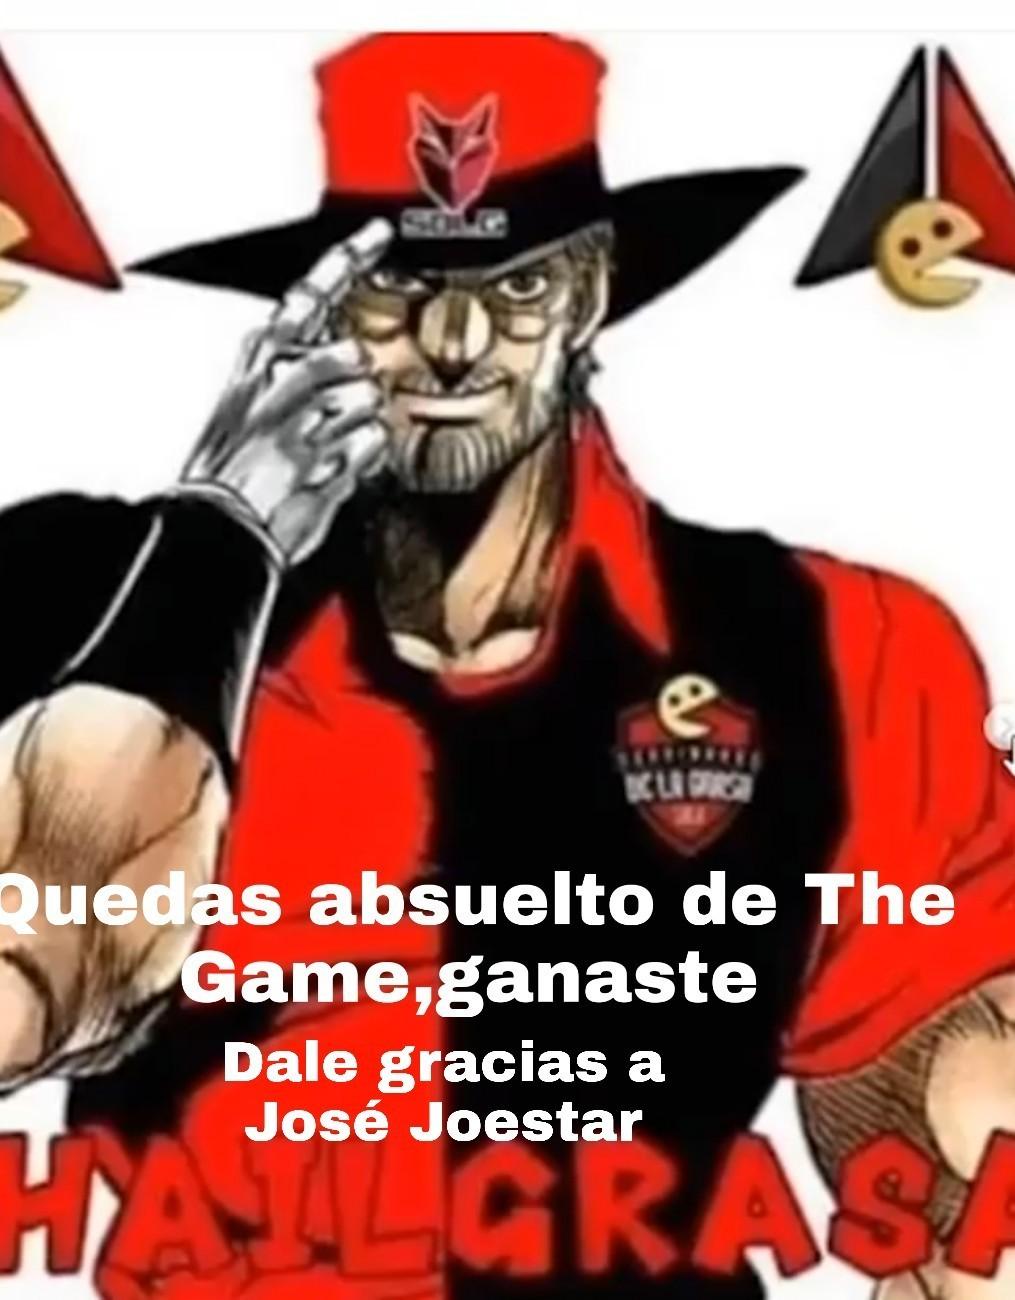 Gracias José - meme